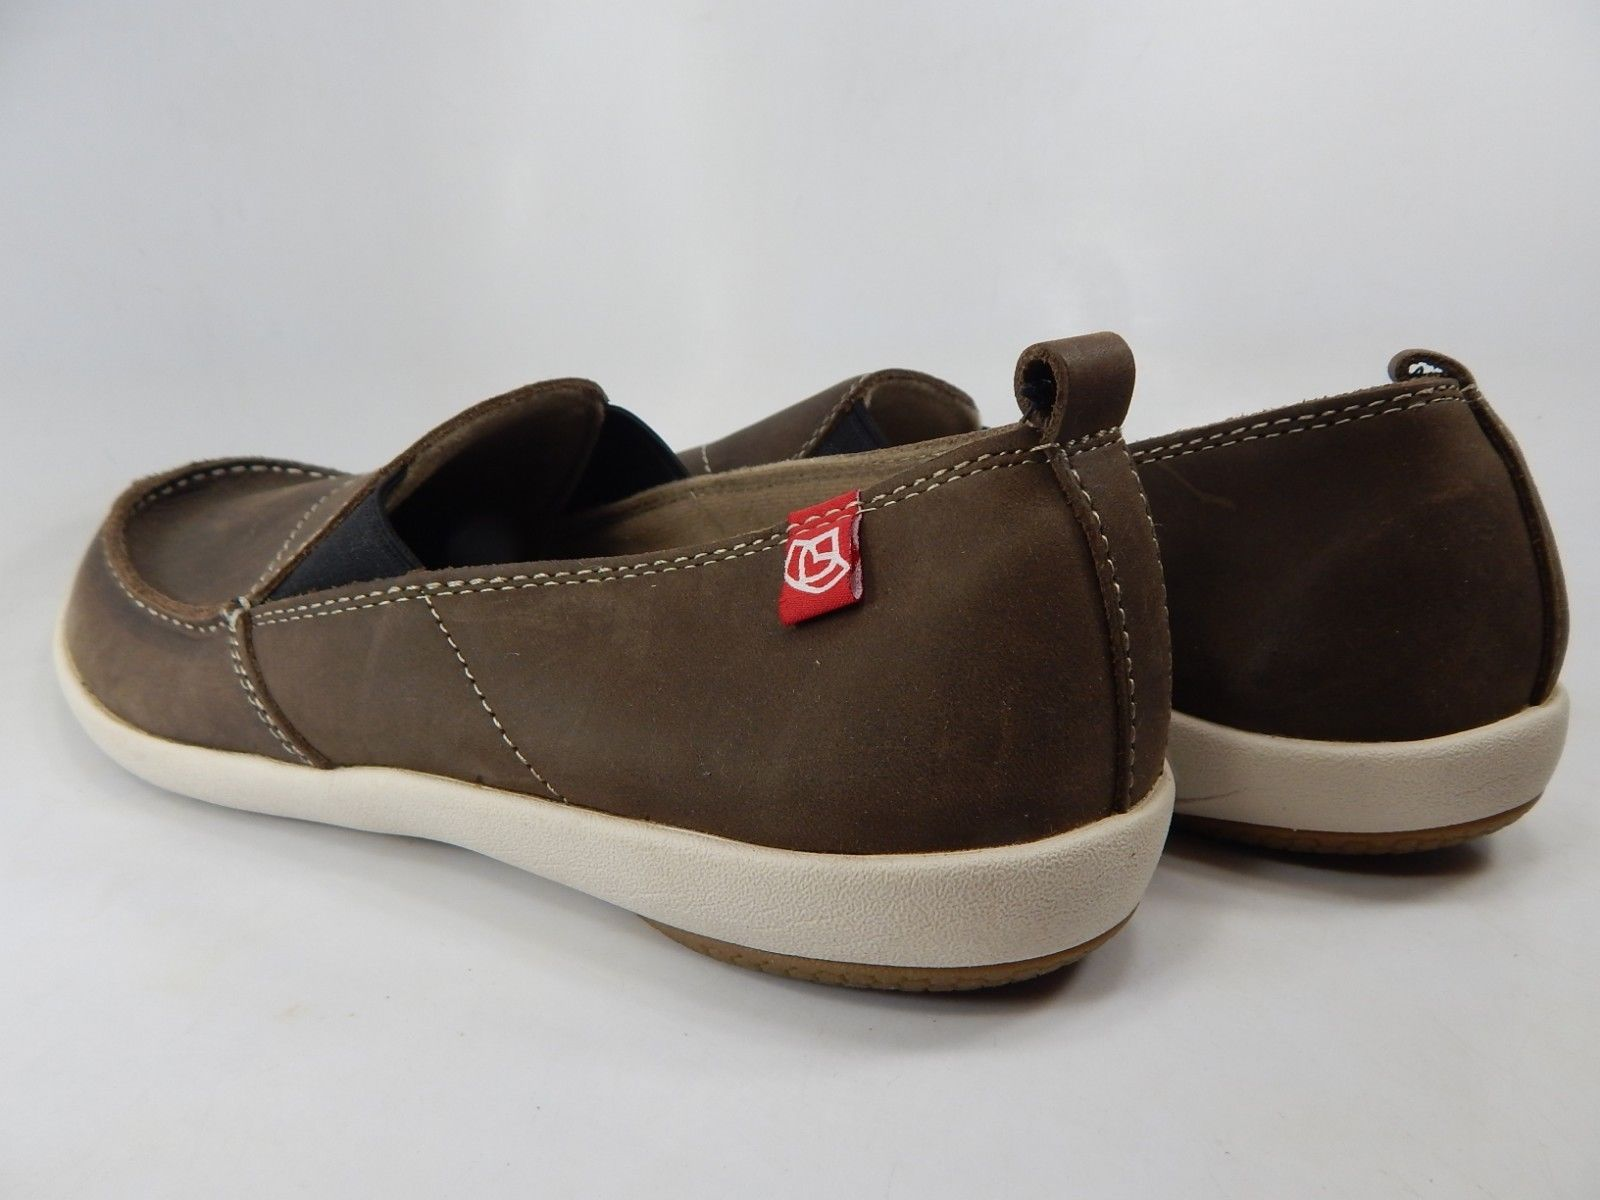 Spenco Siesta Size US 9 M (D) EU 42.5 Men's Slip On Casual Shoes Chocolate Brown